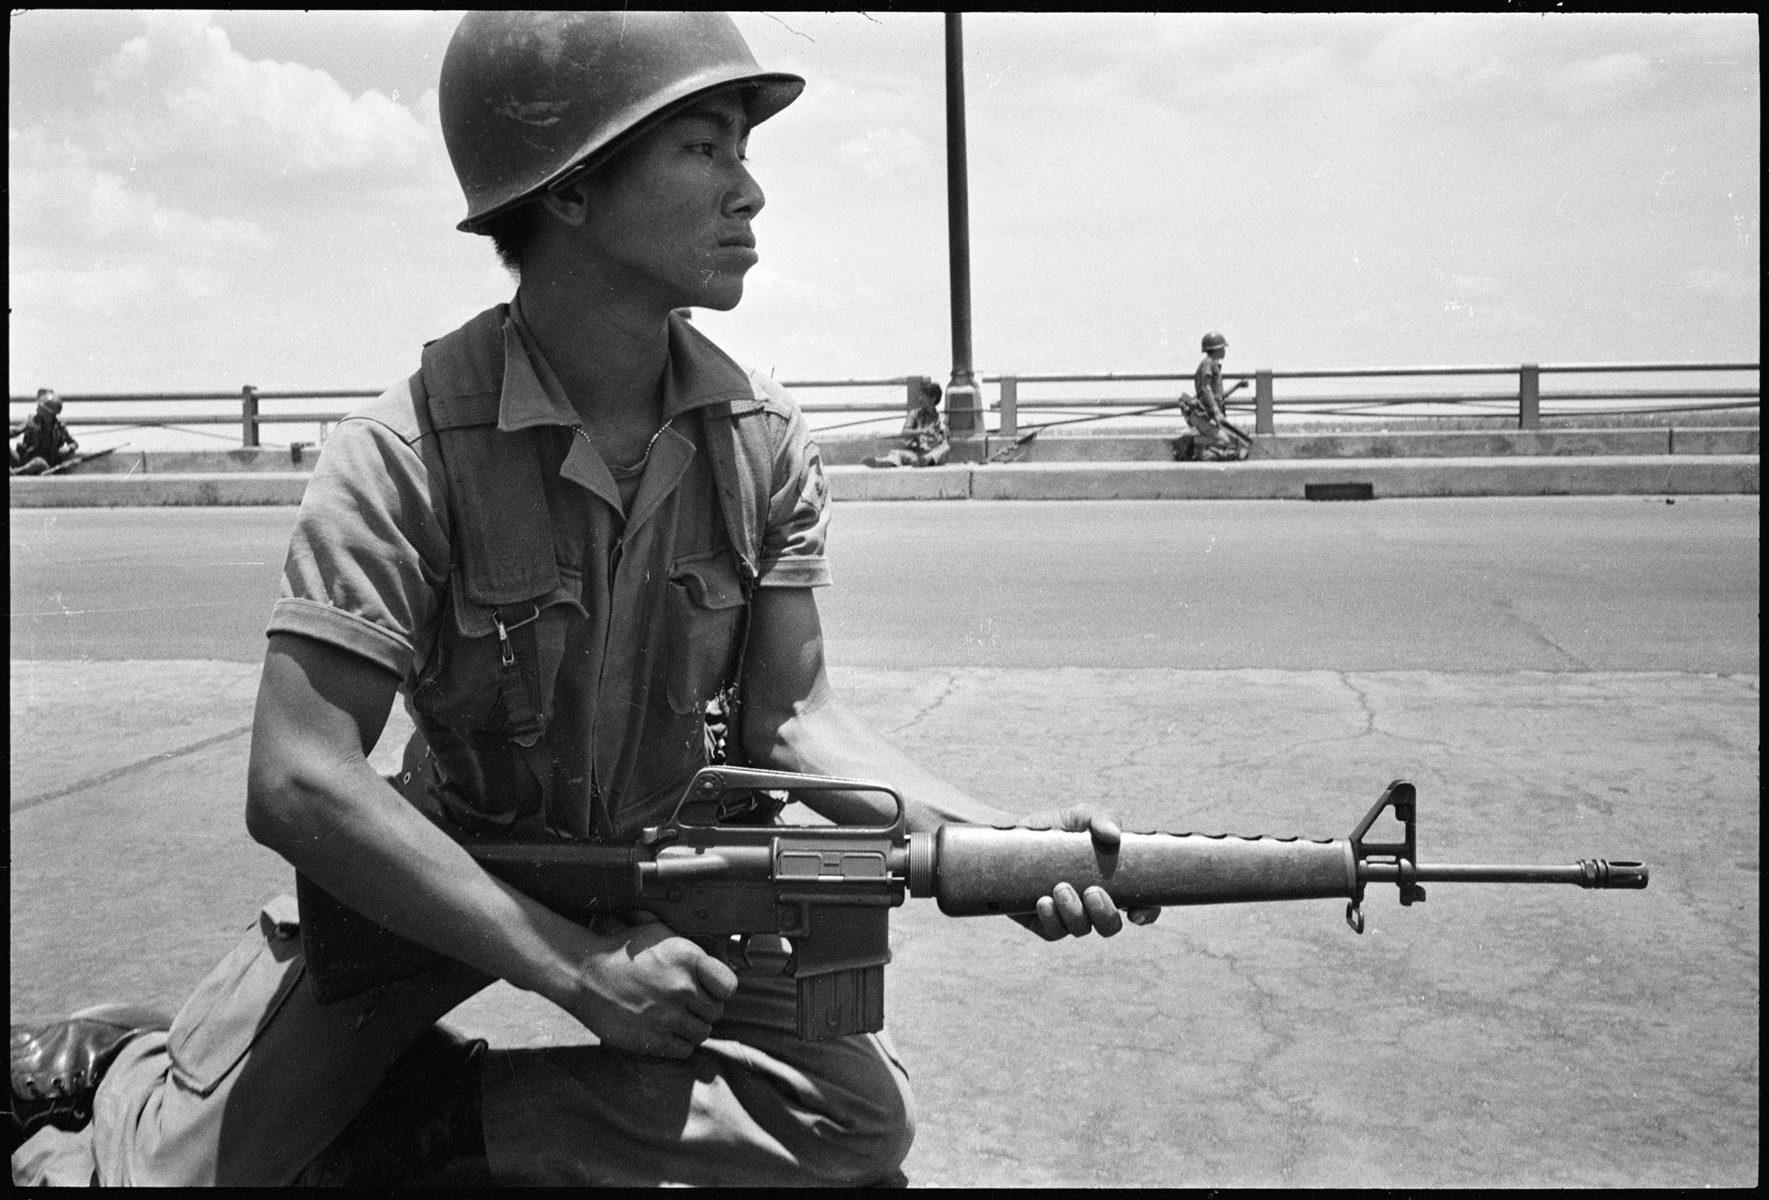 Chute / Libération de Saigon, avril 1975 DCL_1975_005_39A-e1616646154958